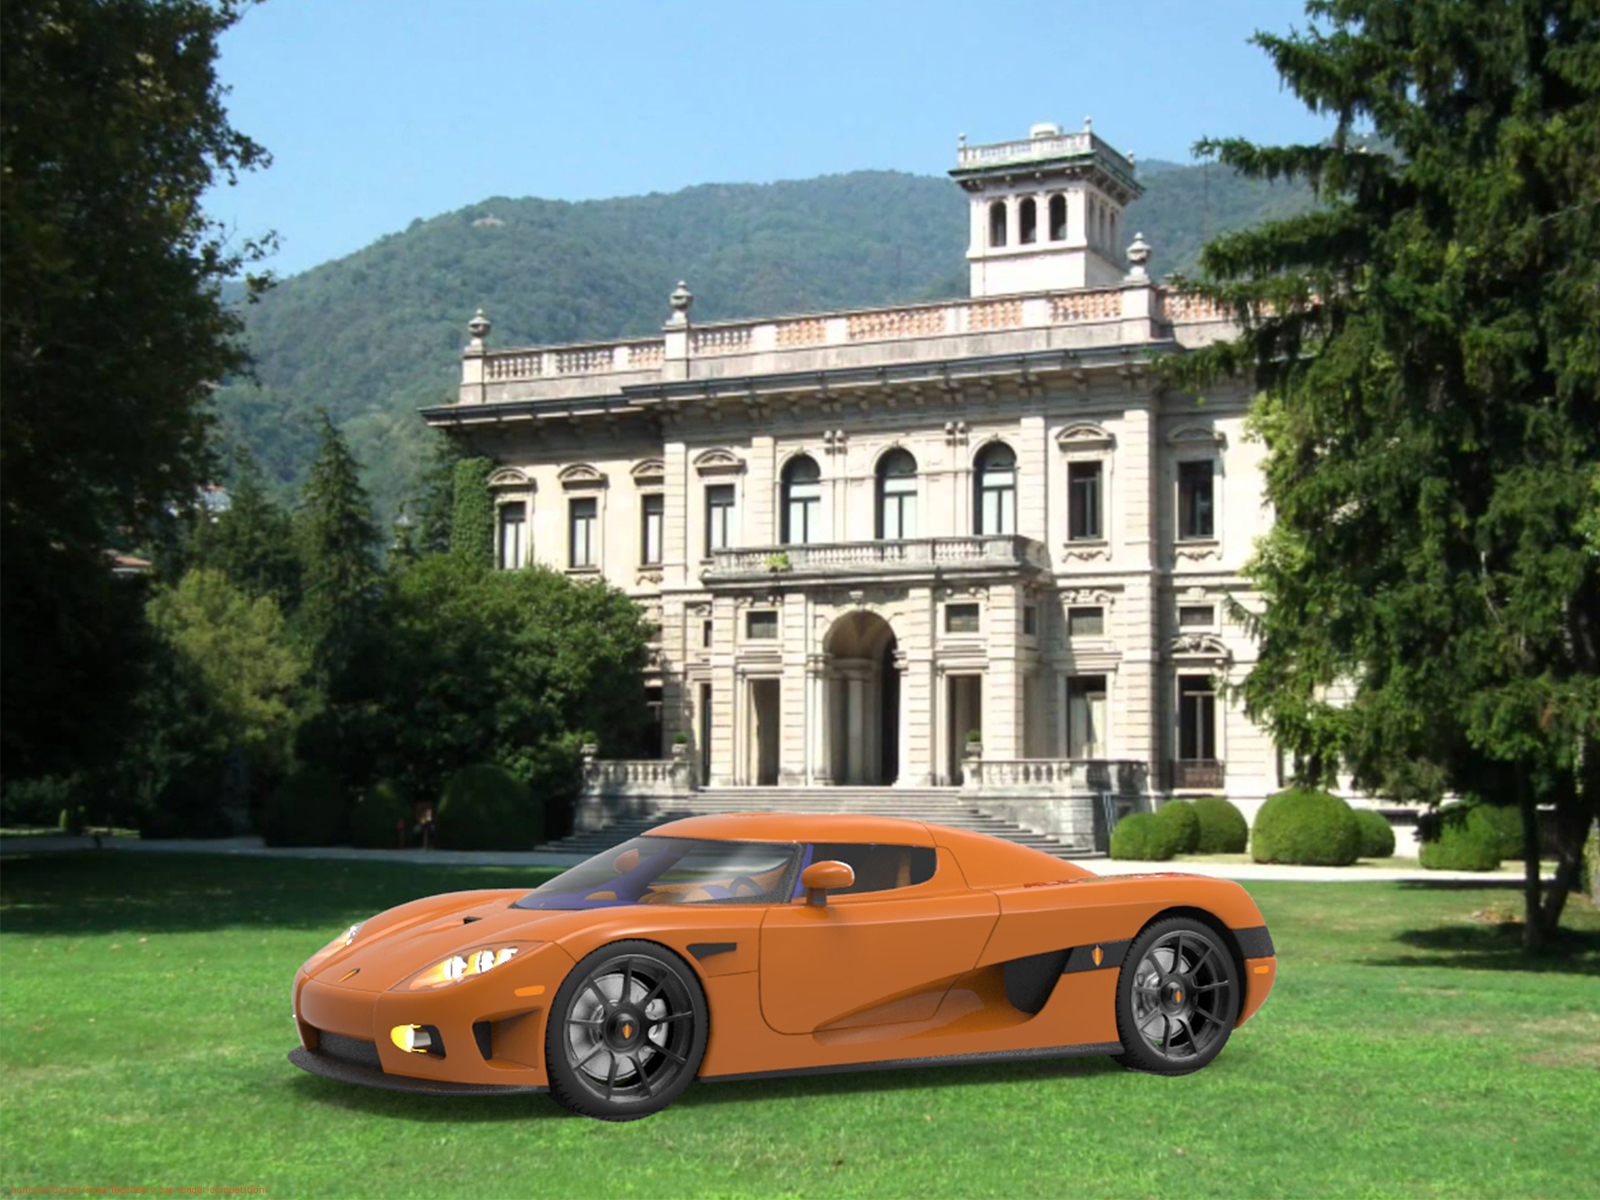 My motivation to become a car designer 3d art